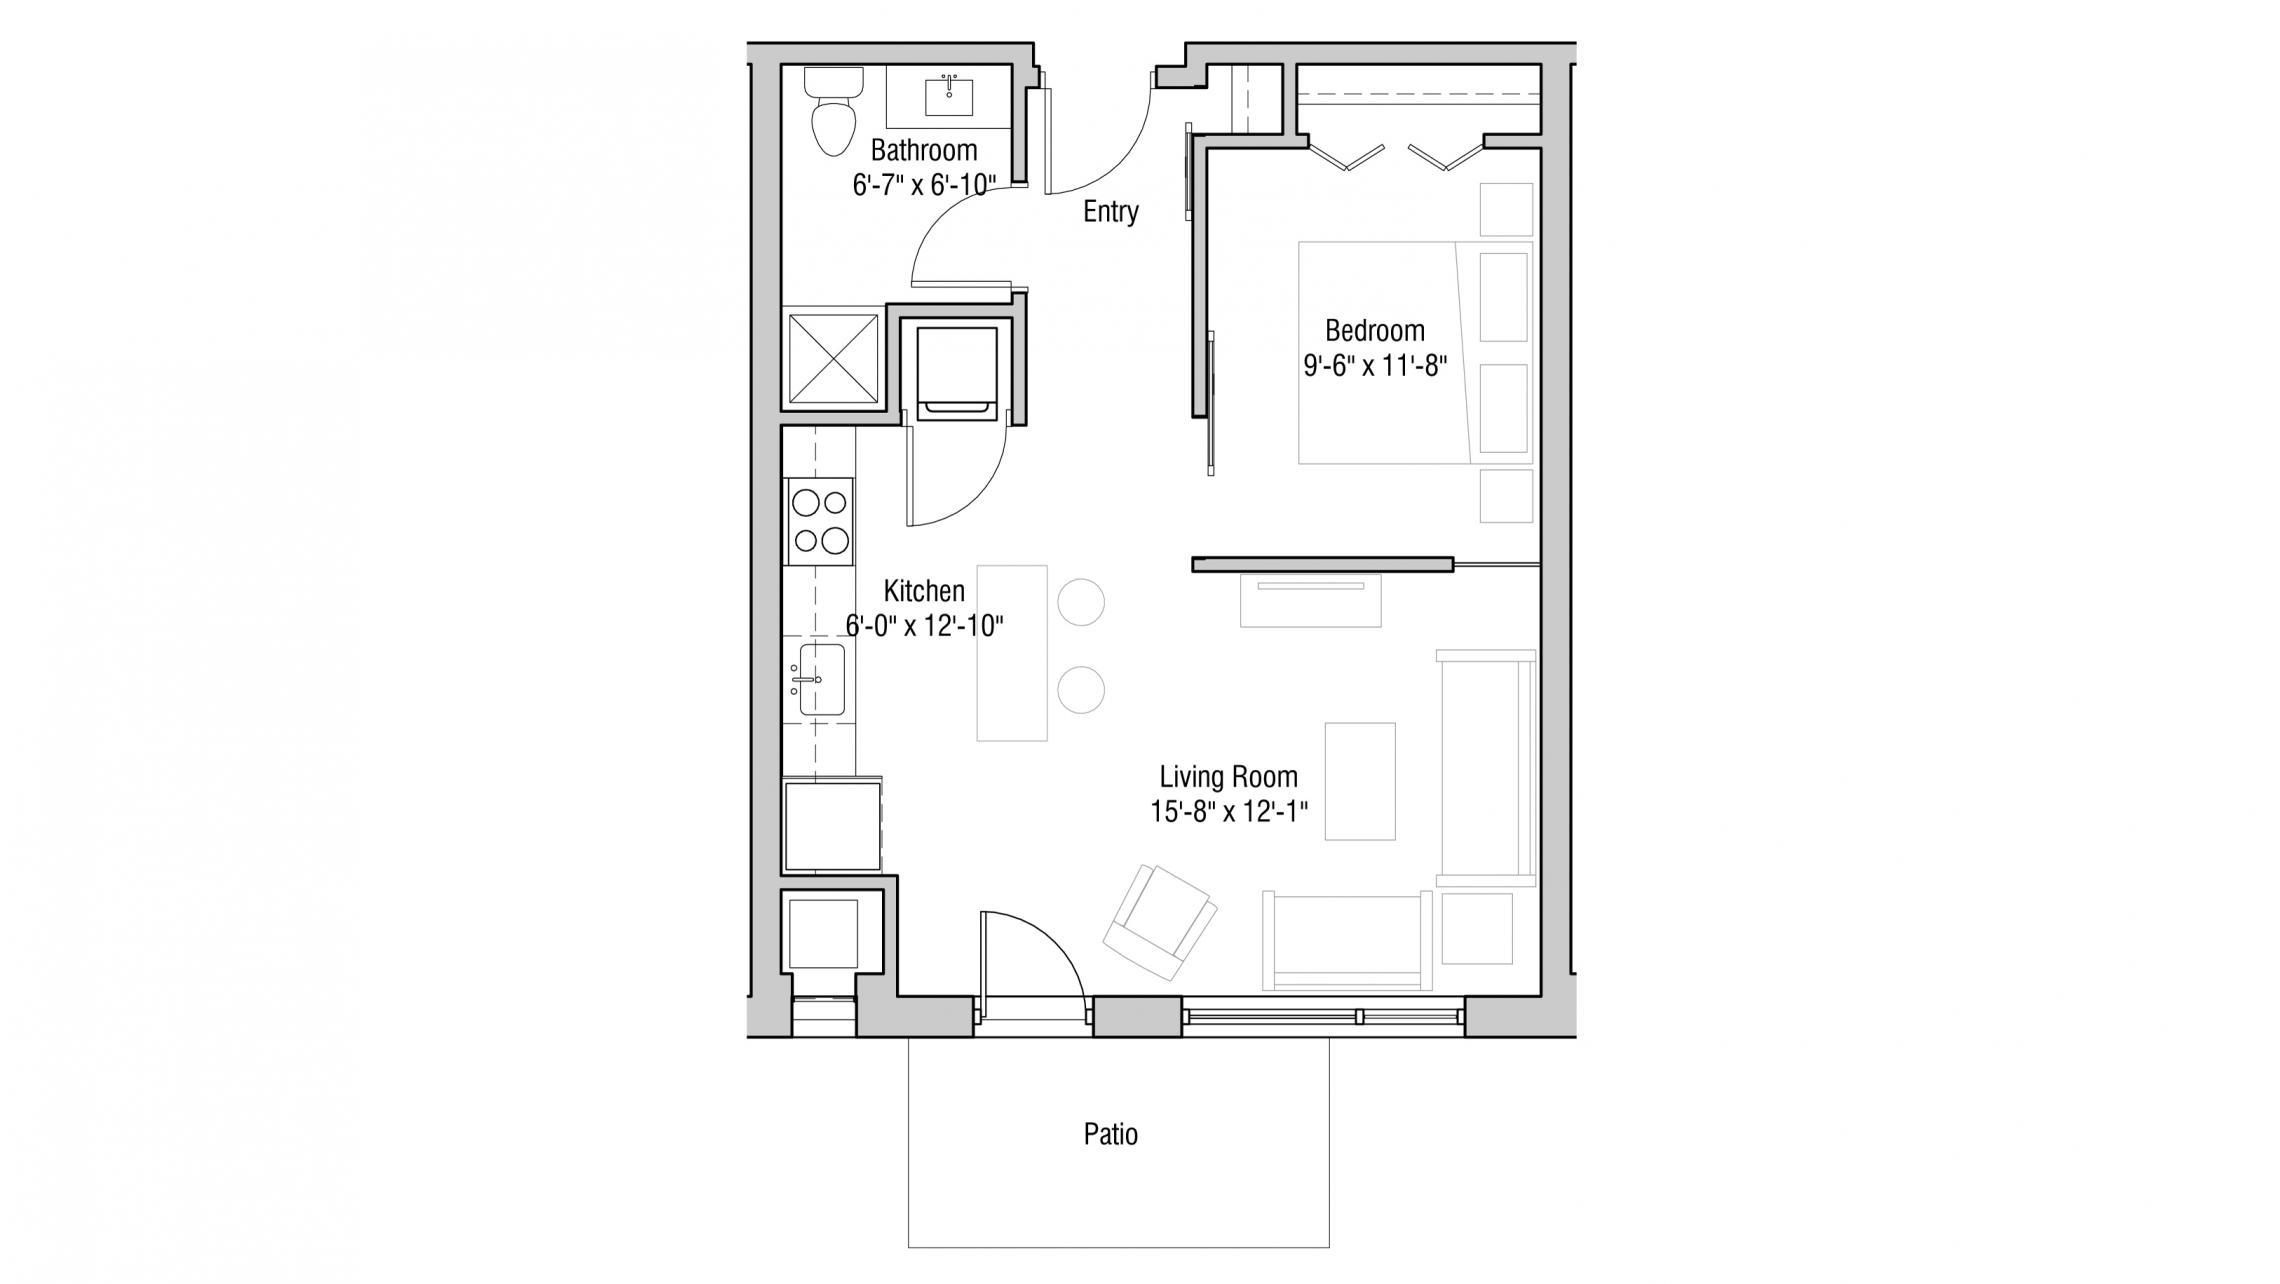 ULI Quarter Row 108 - One Bedroom, One Bathroom